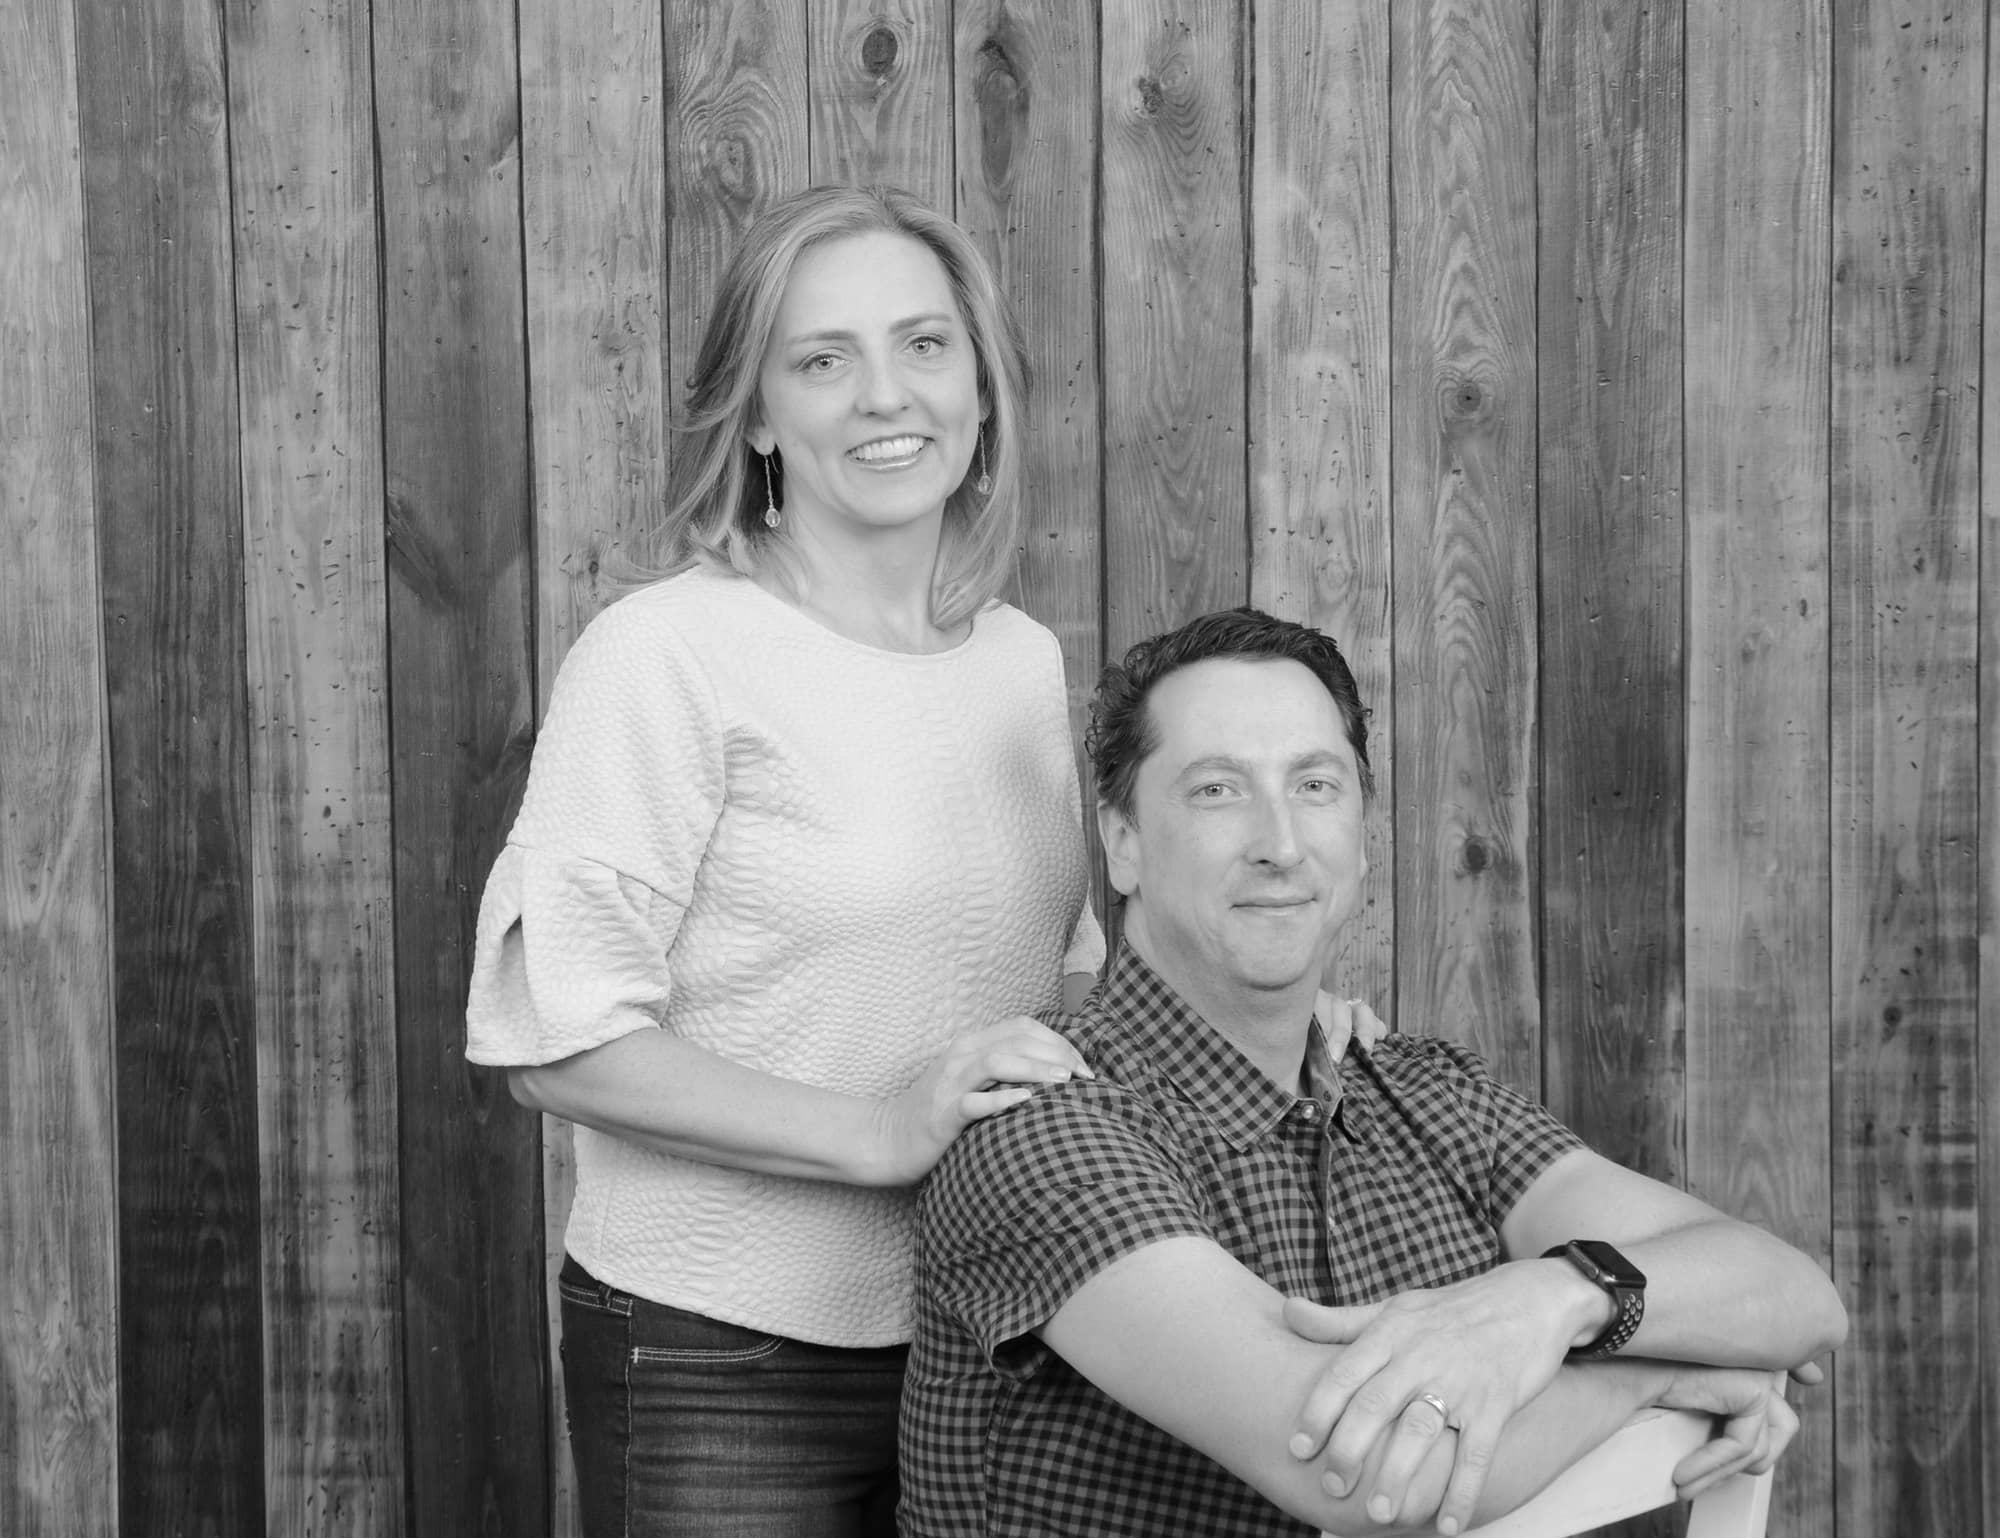 I'm glad we got a photo of just my husband and me together at Portrait Studio